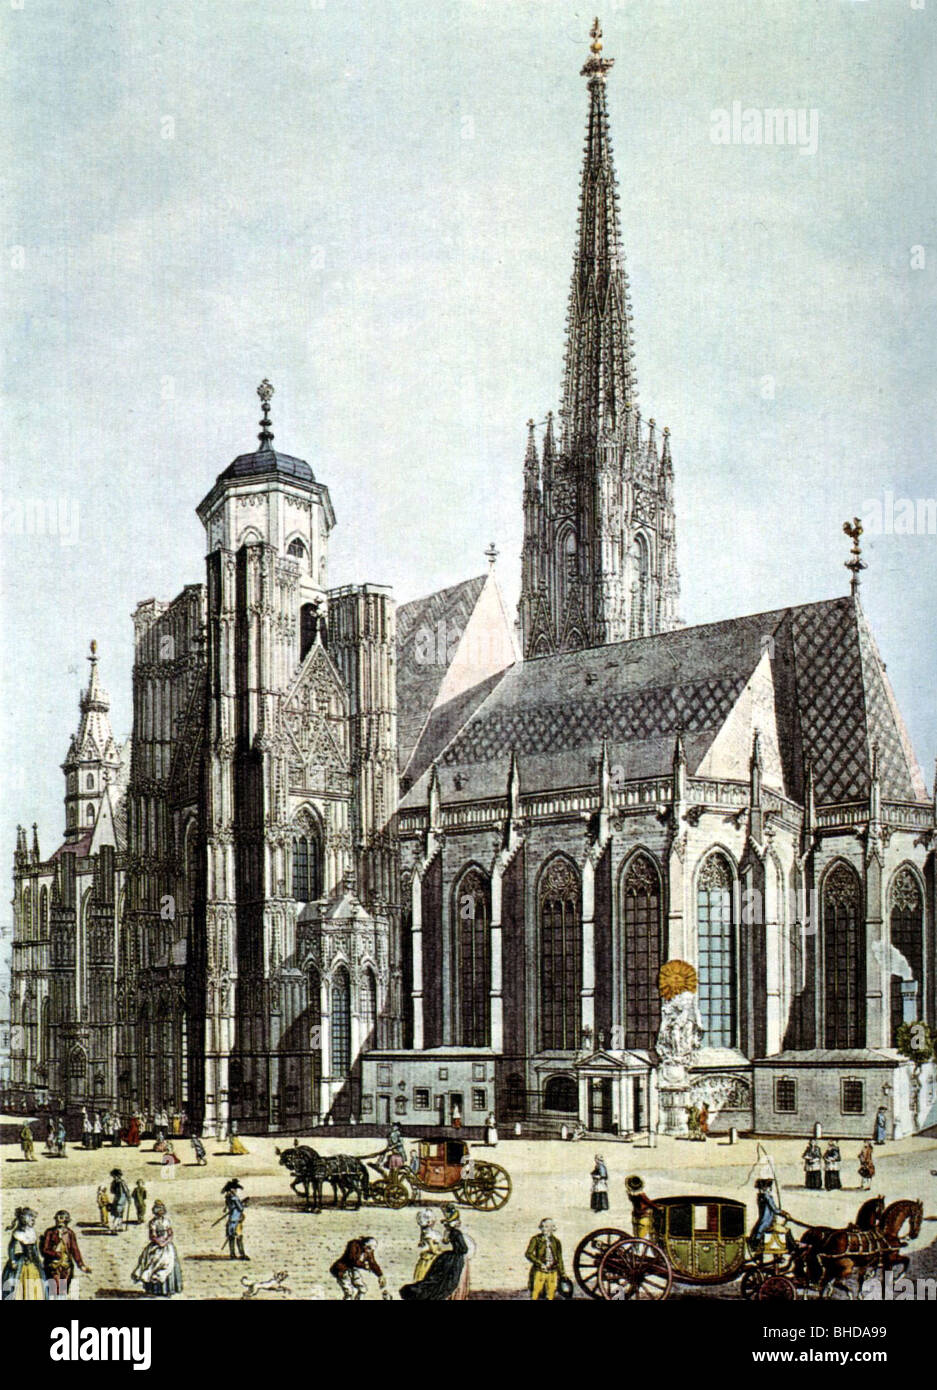 http://c8.alamy.com/comp/BHDA99/geography-travel-austria-vienna-st-stephans-church-coloured-drawing-BHDA99.jpg